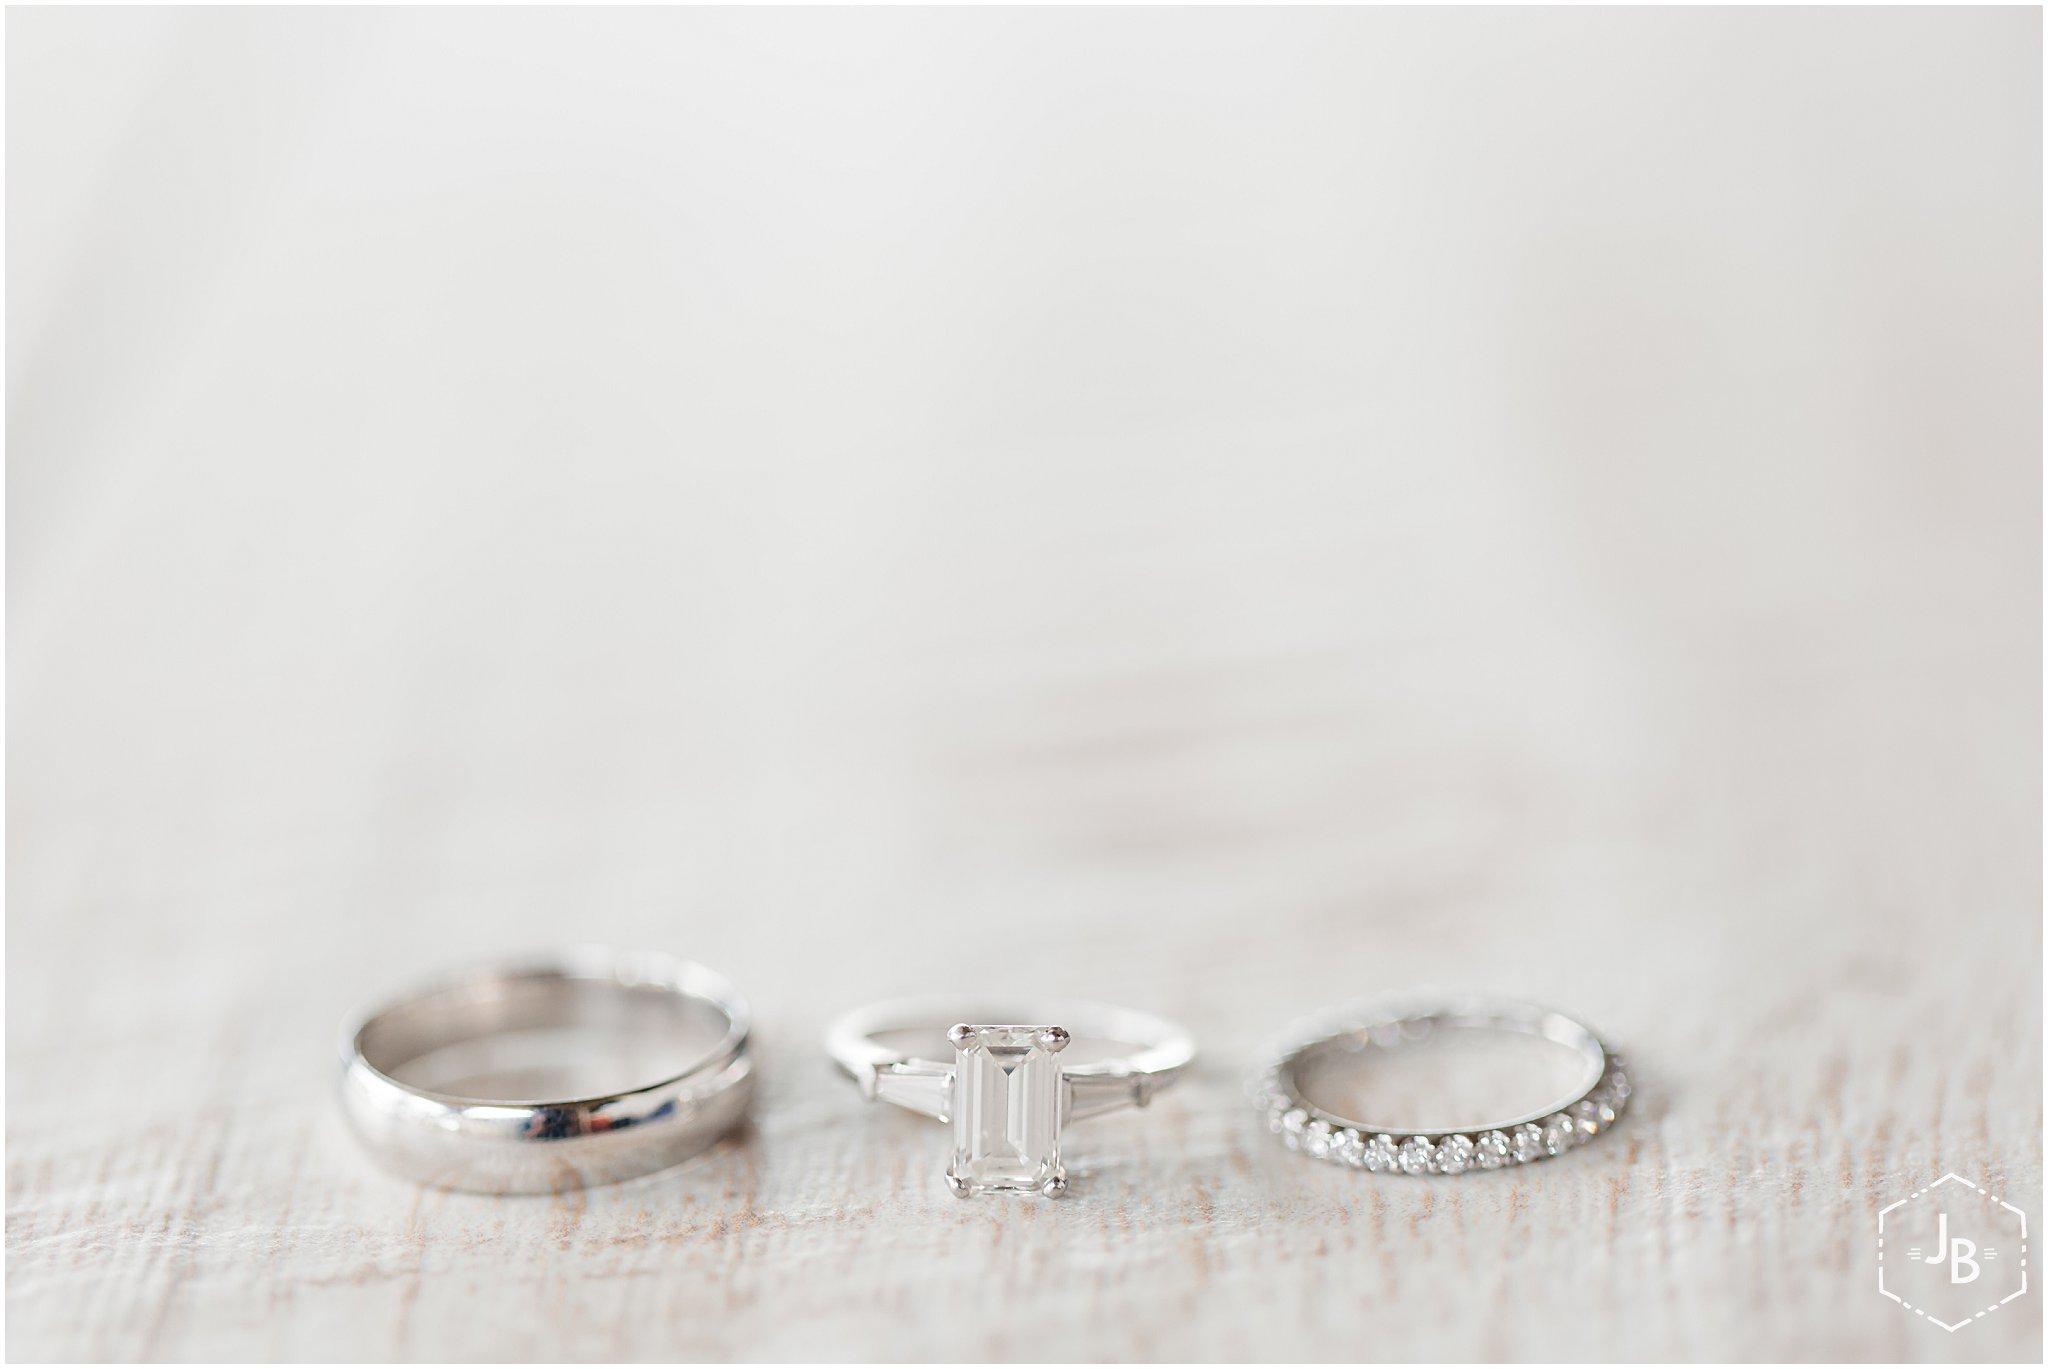 WeddingandEngagementFloridaPhotographer_0191.jpg